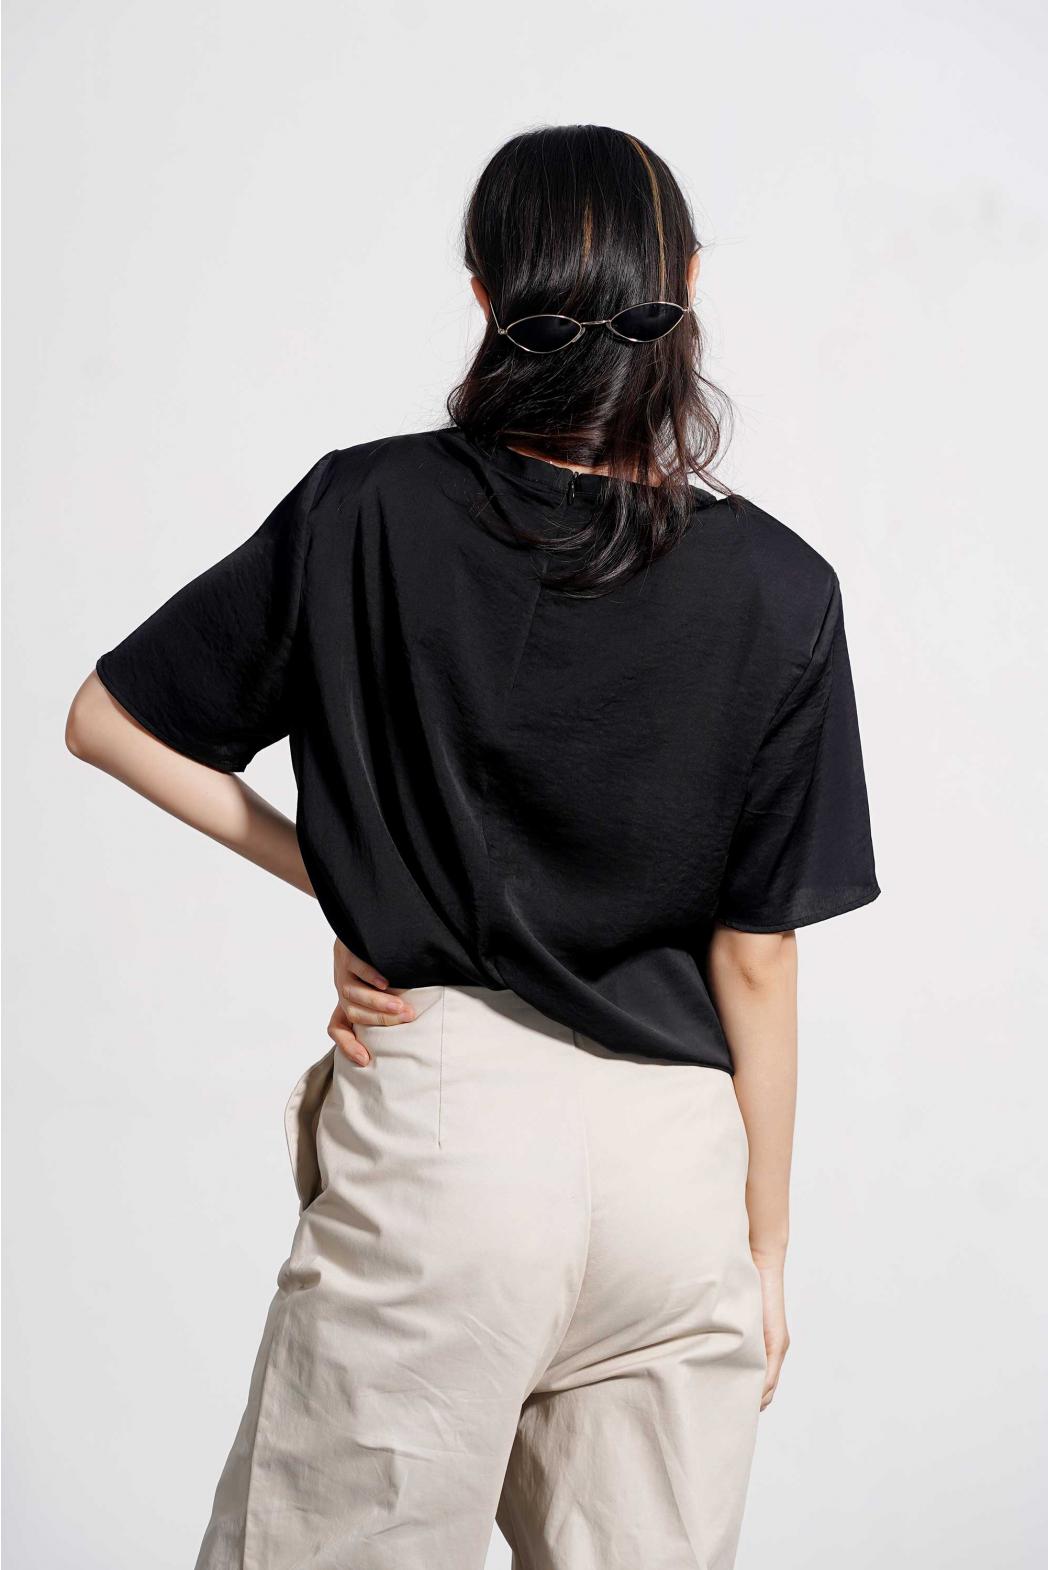 Áo kiểu tay ngắn đệm vai. Satin PE/Vis - 10F20SHSW012